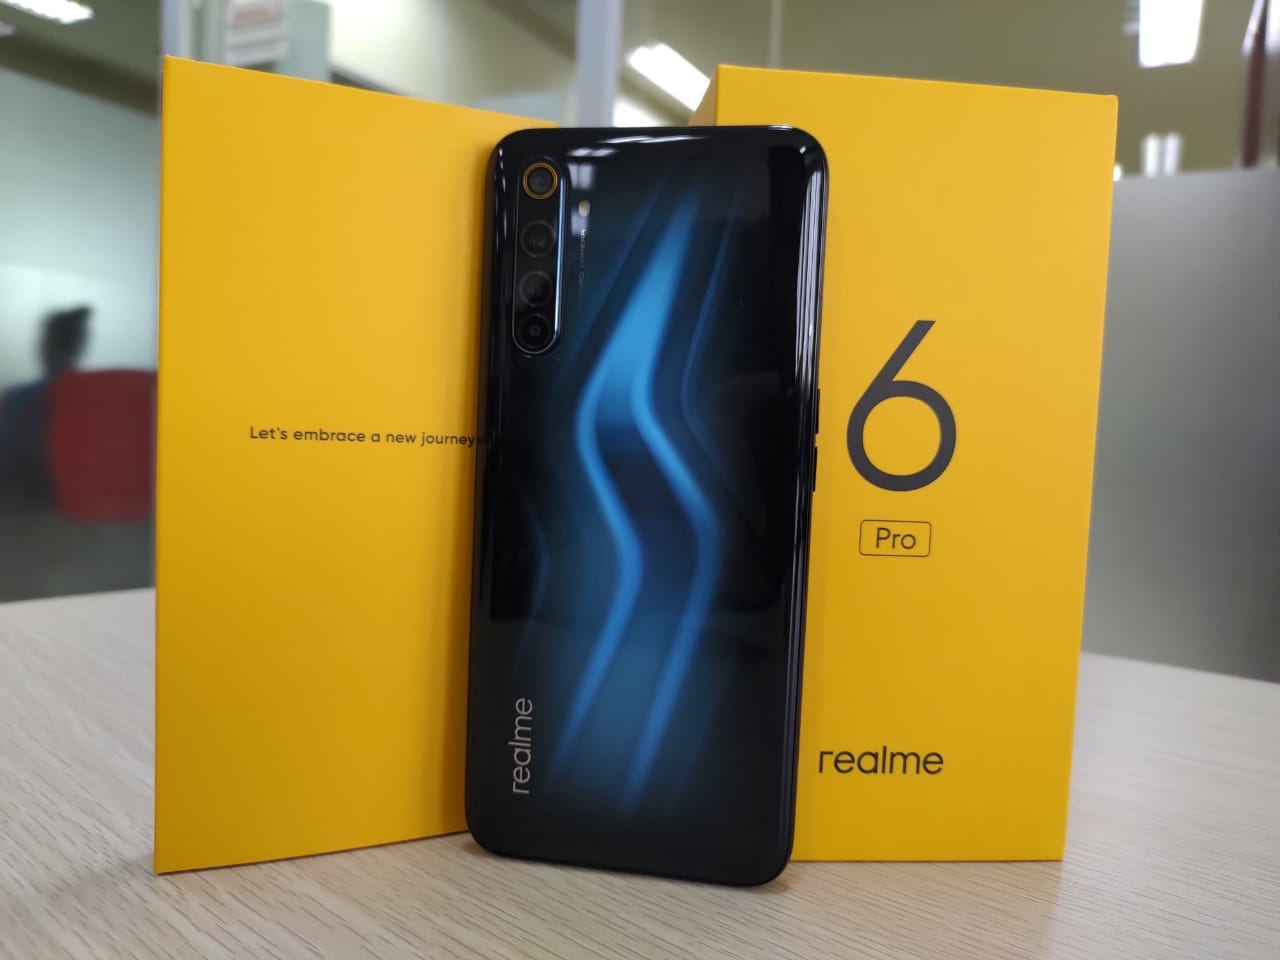 Unboxing realme 6 Pro, Meluncur di Indonesia Bulan Ini - Medcom.id